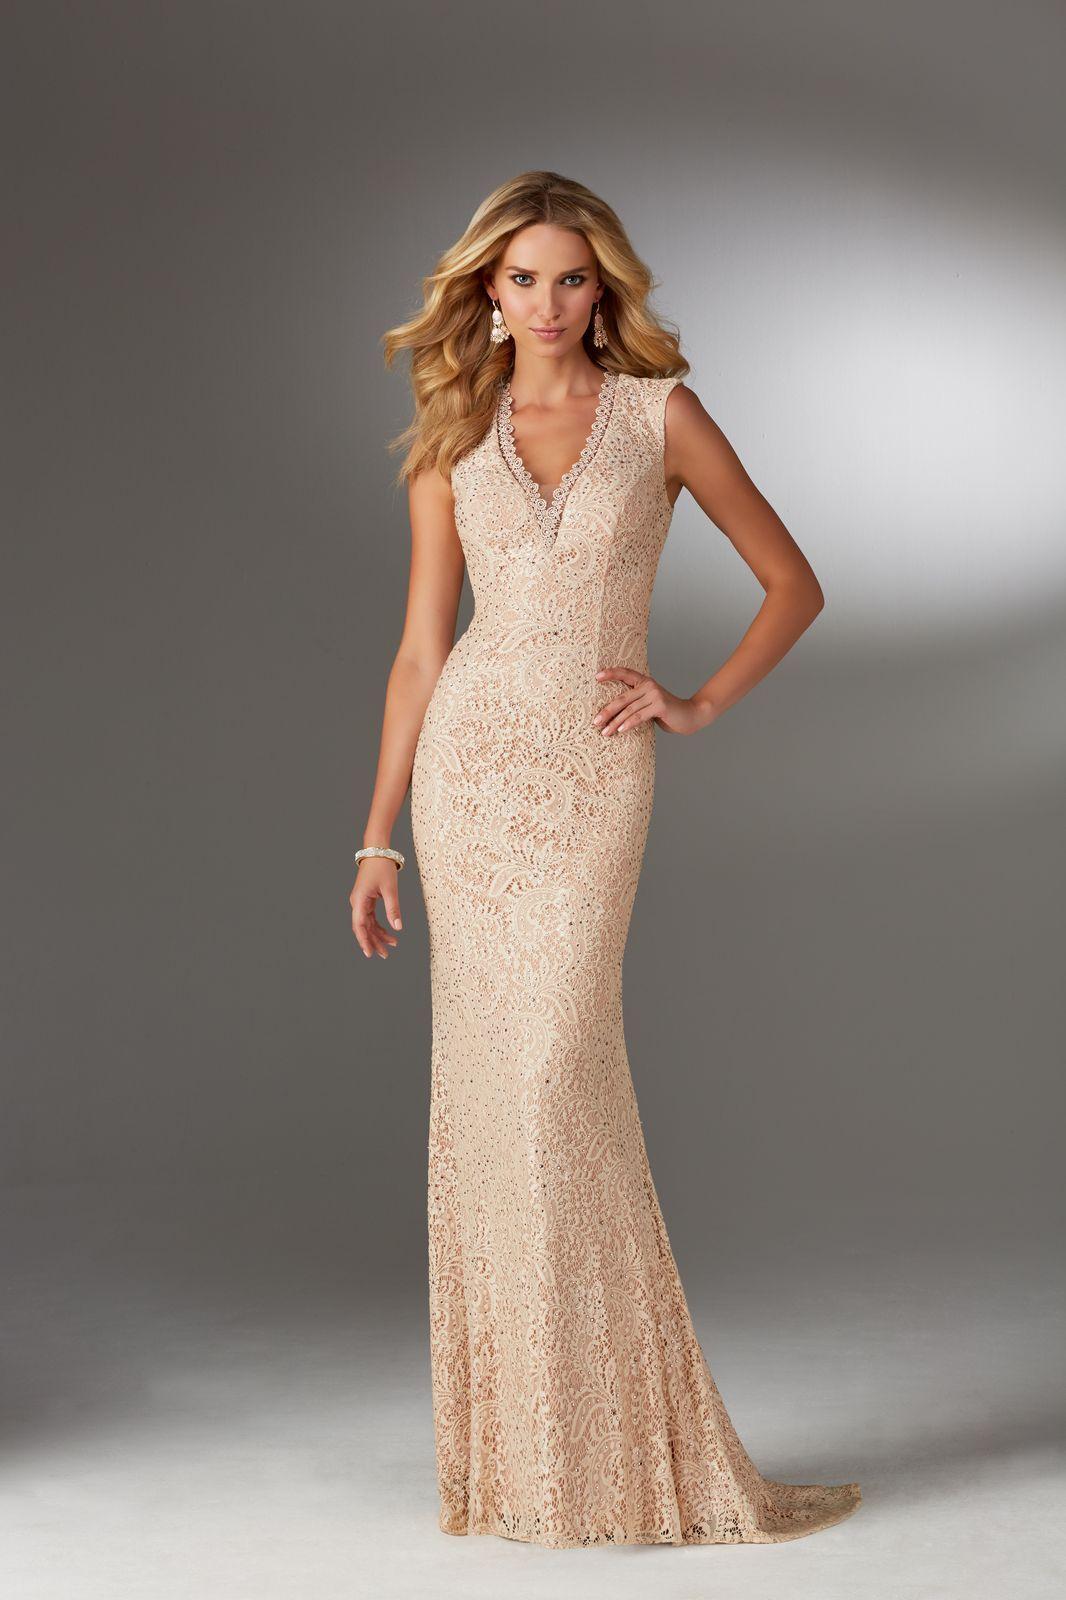 64954bf9f8f Elegancka dopasowana suknia wieczorowa Mori Lee z koronki i dekoltem V.  Piękna